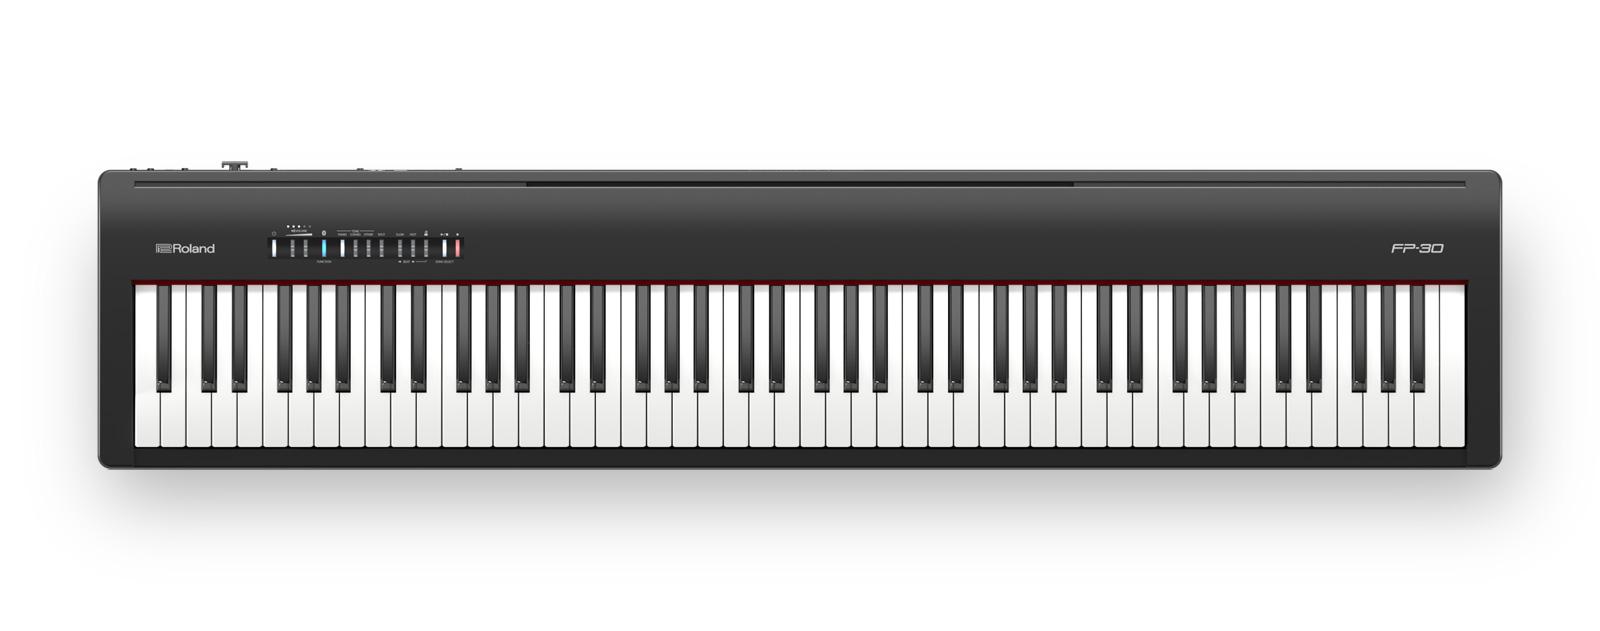 Roland fp 30 keys